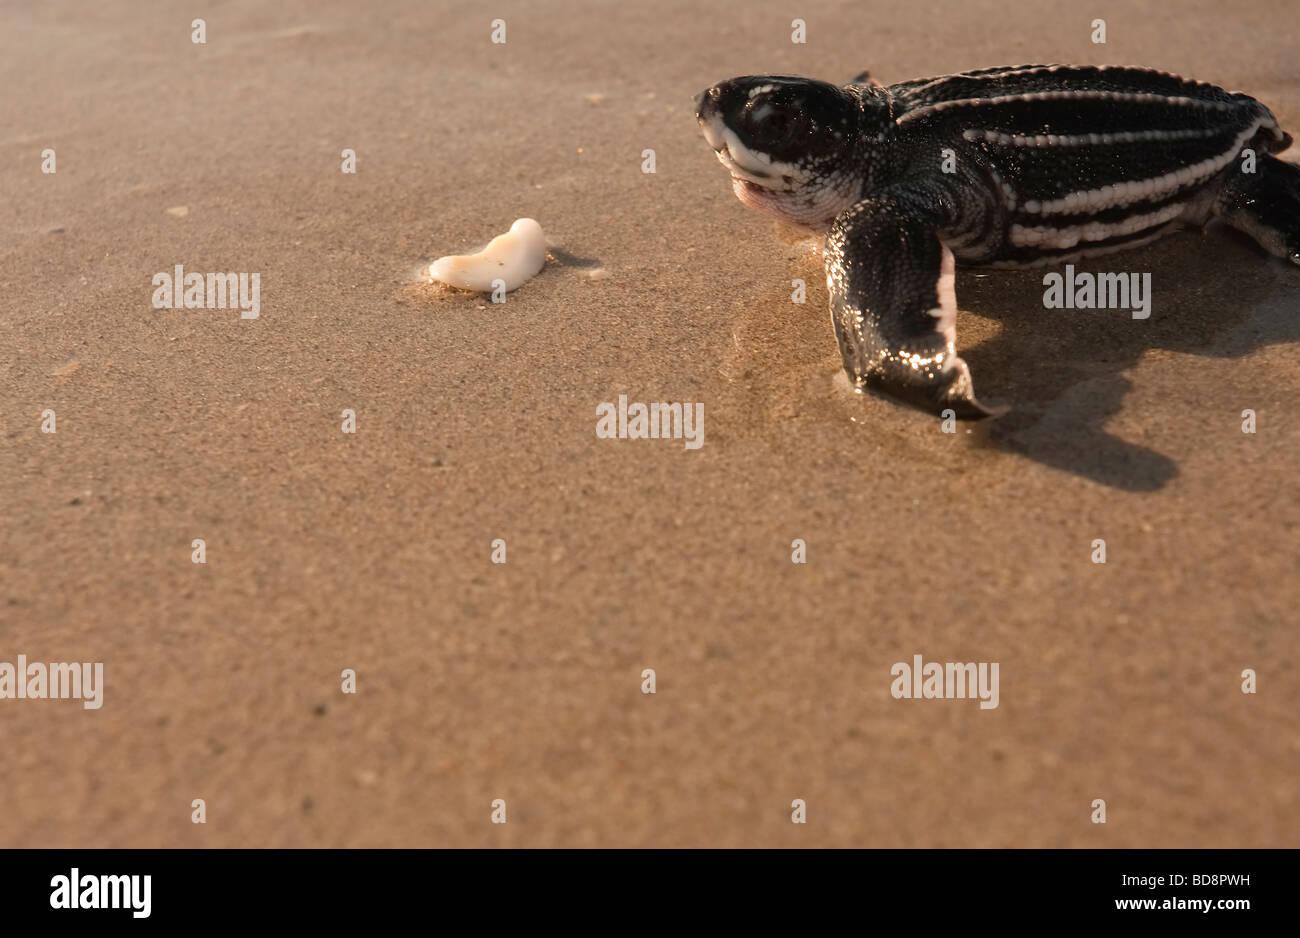 Leatherback sea turtle hatchling crawling towards the ocean - Stock Image